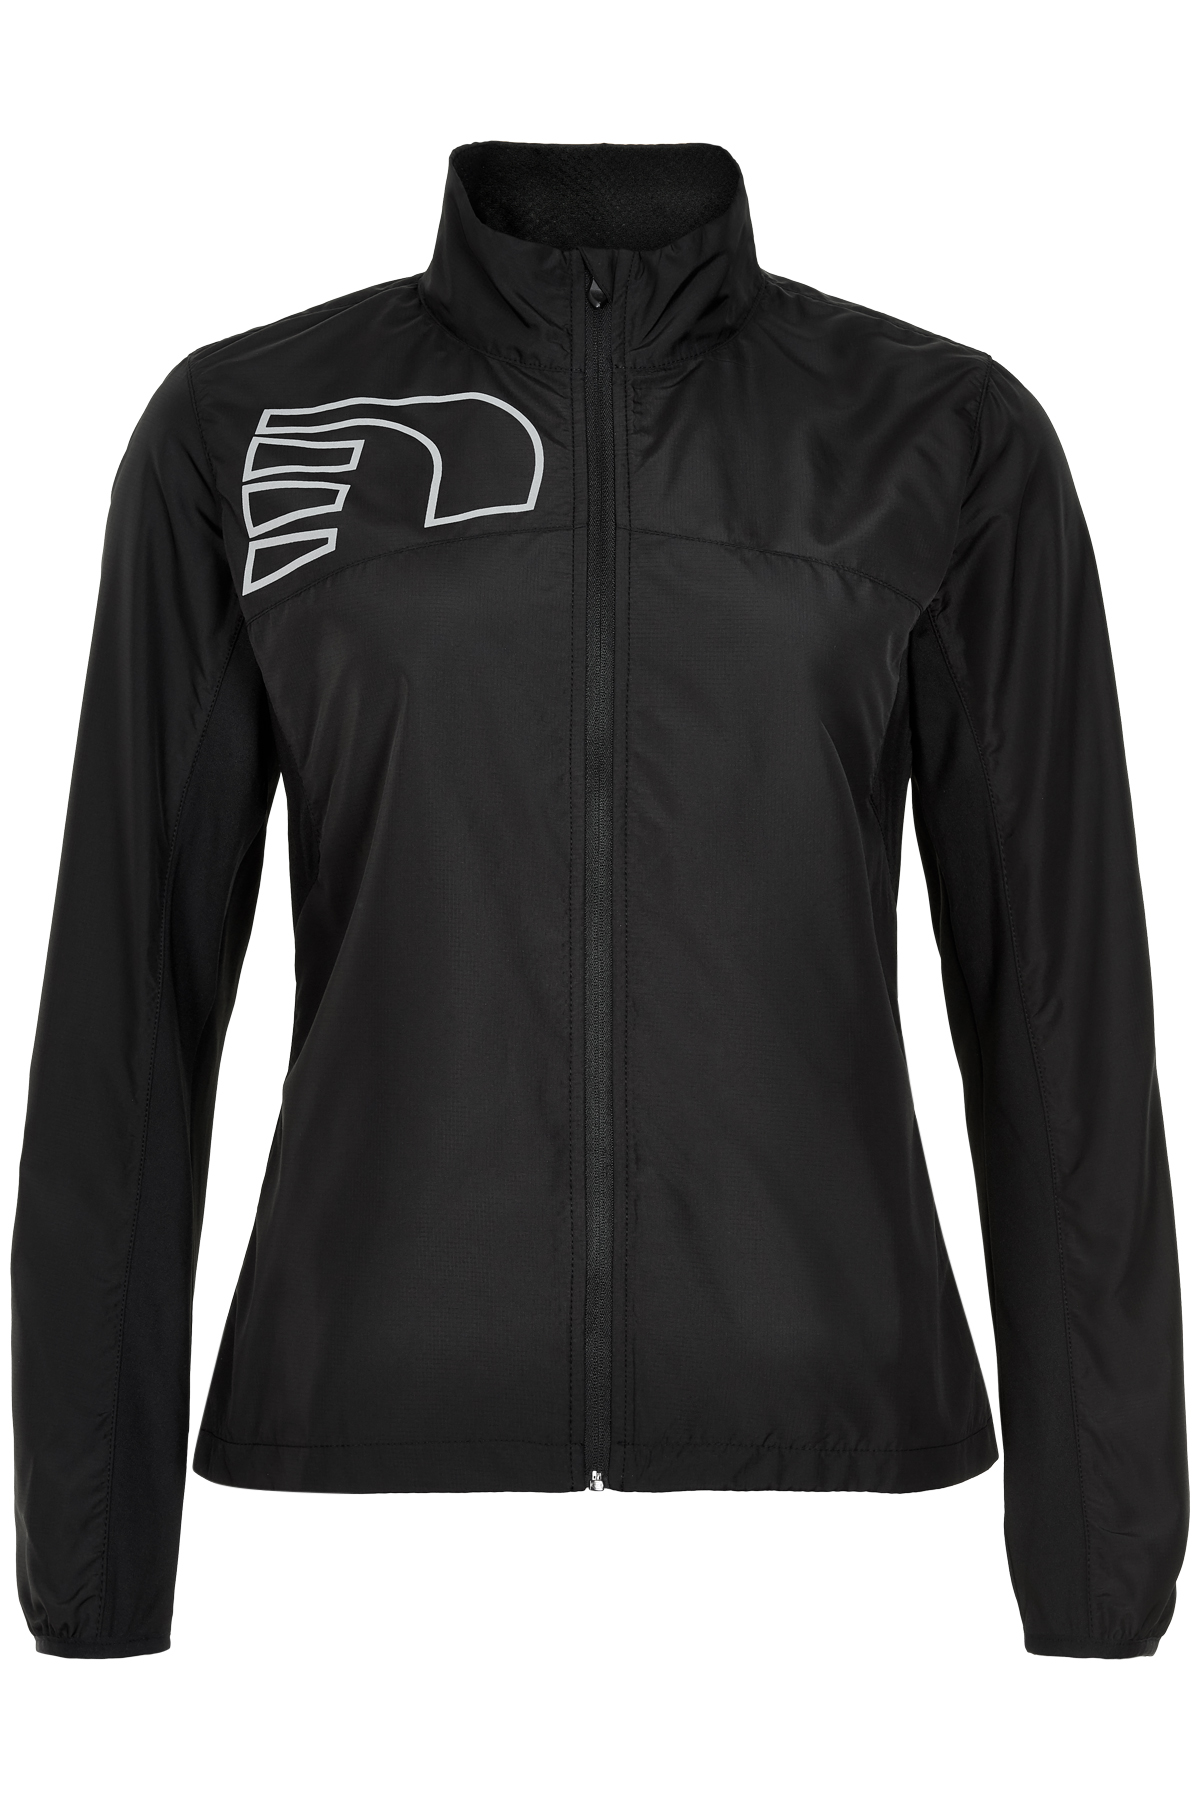 Newline Core Cross jakke, black, medium